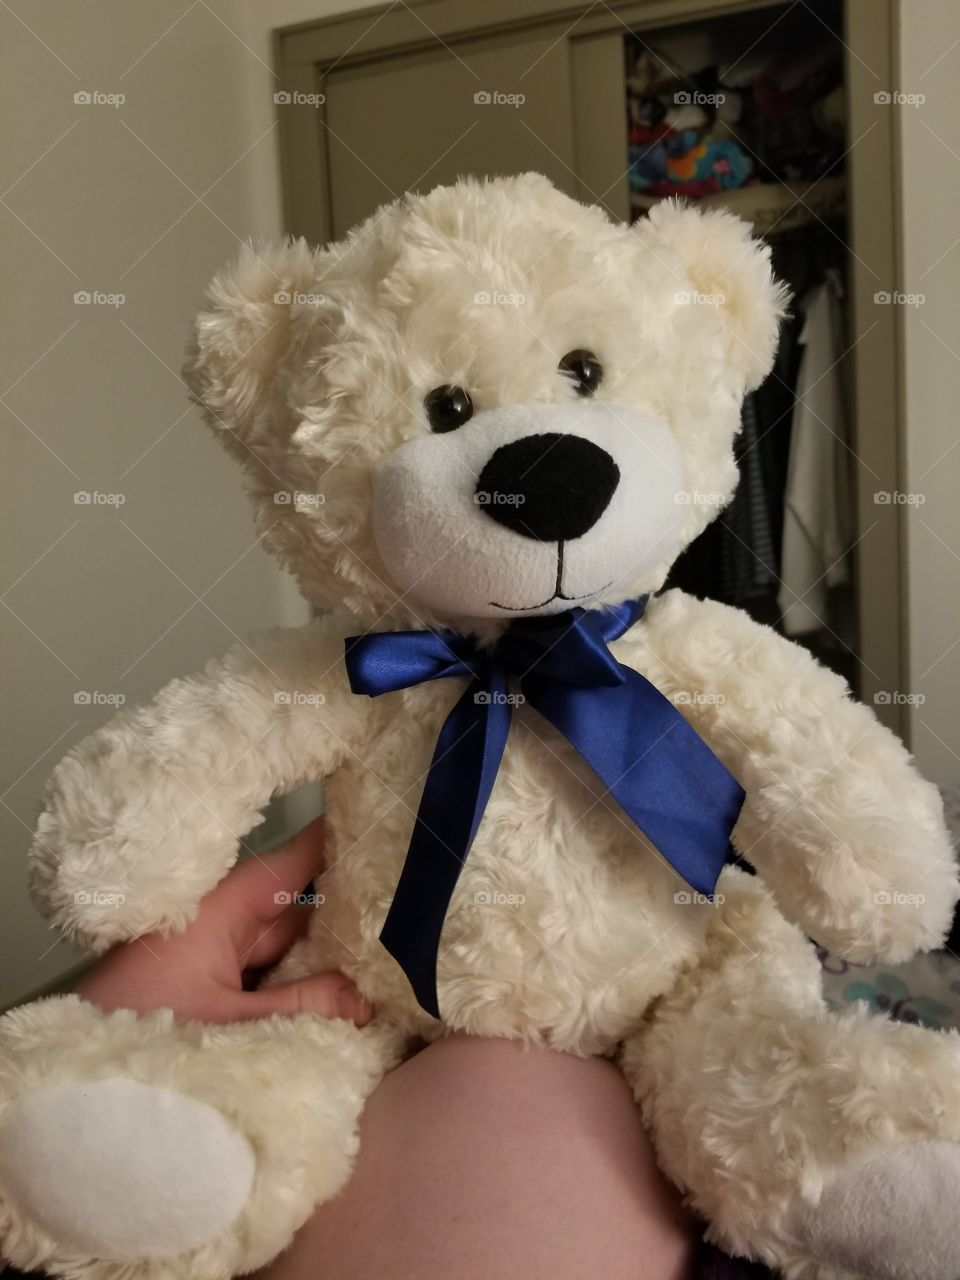 fluffy, stuffed best friend